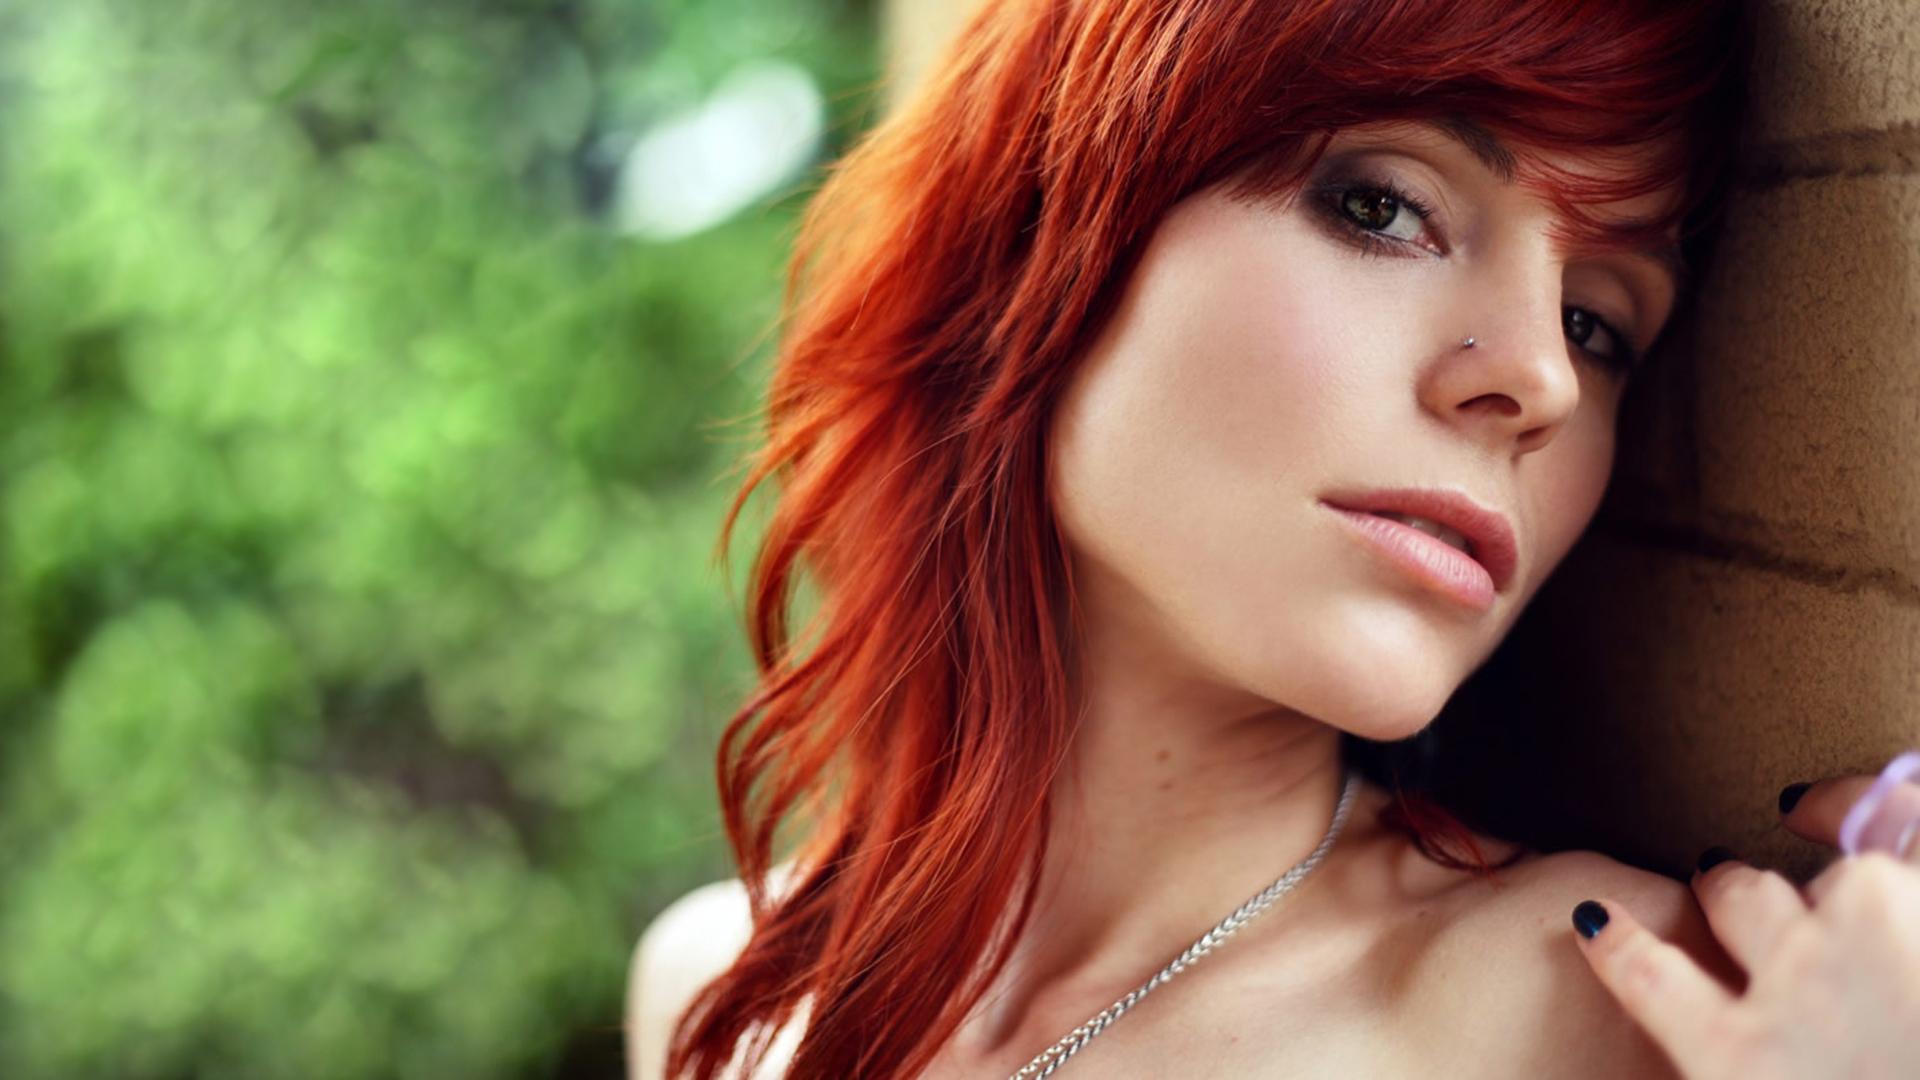 hot-redhead-wallpaper